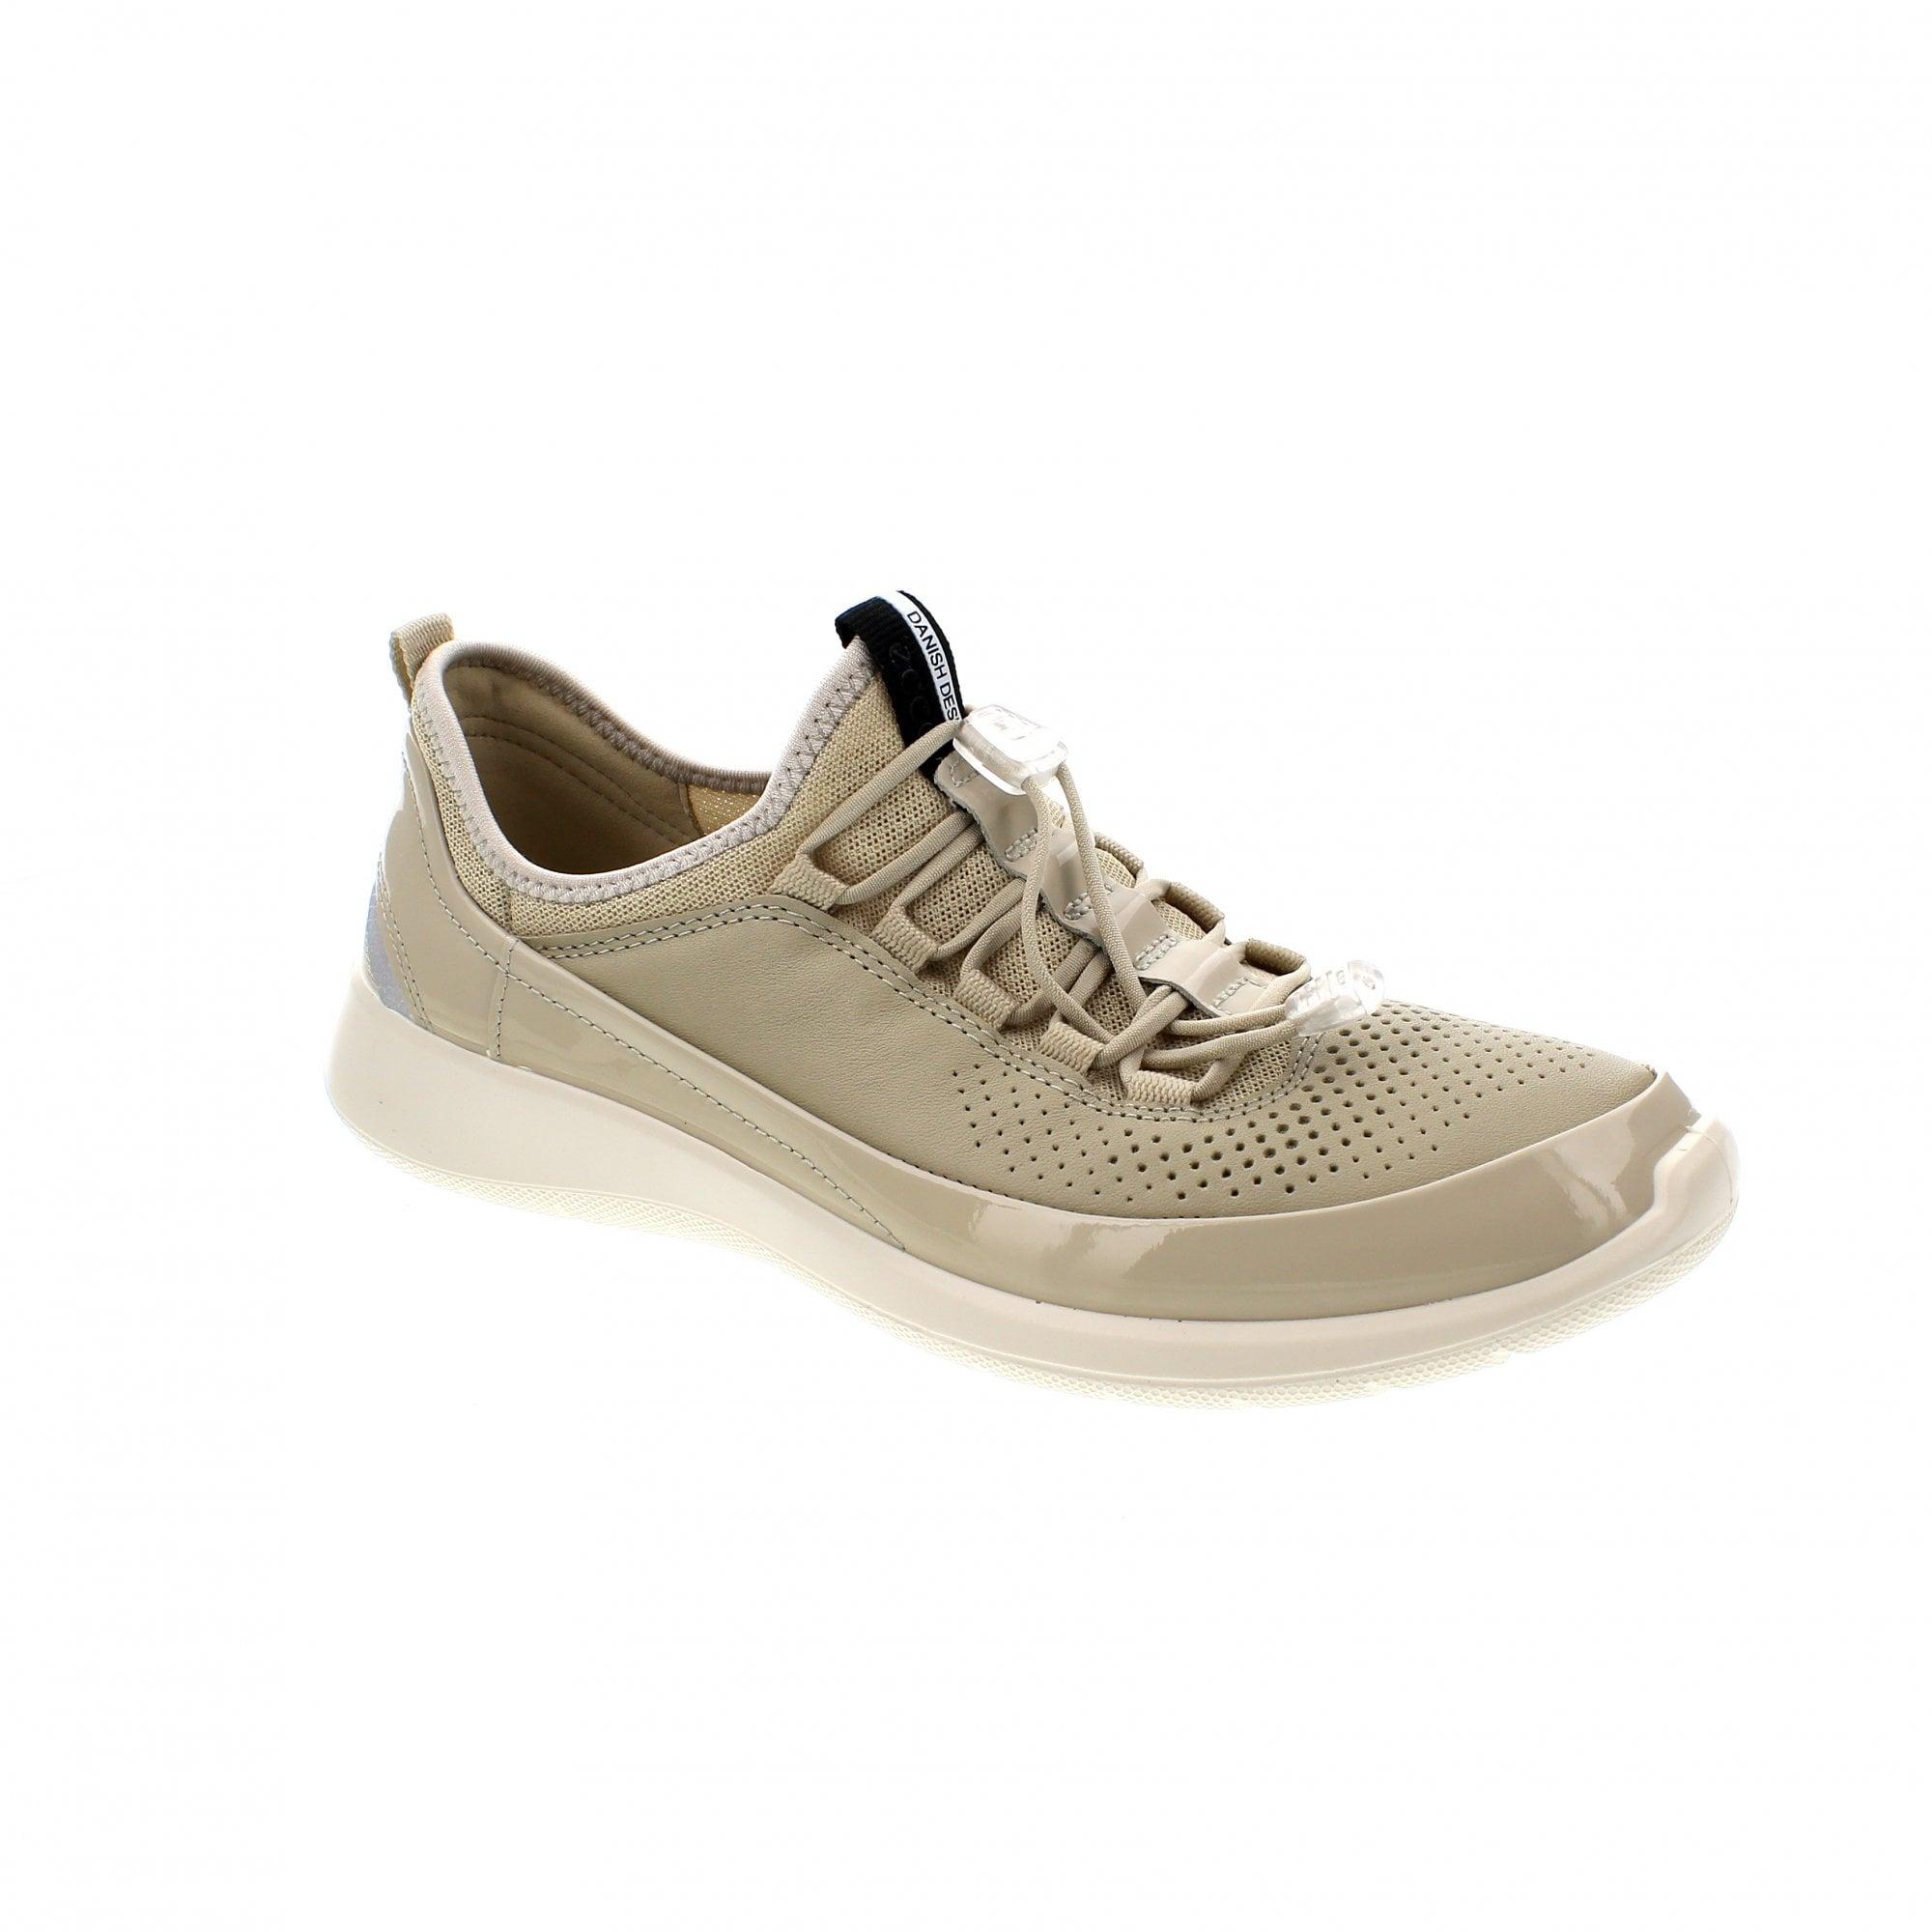 ecco shoes uk head office